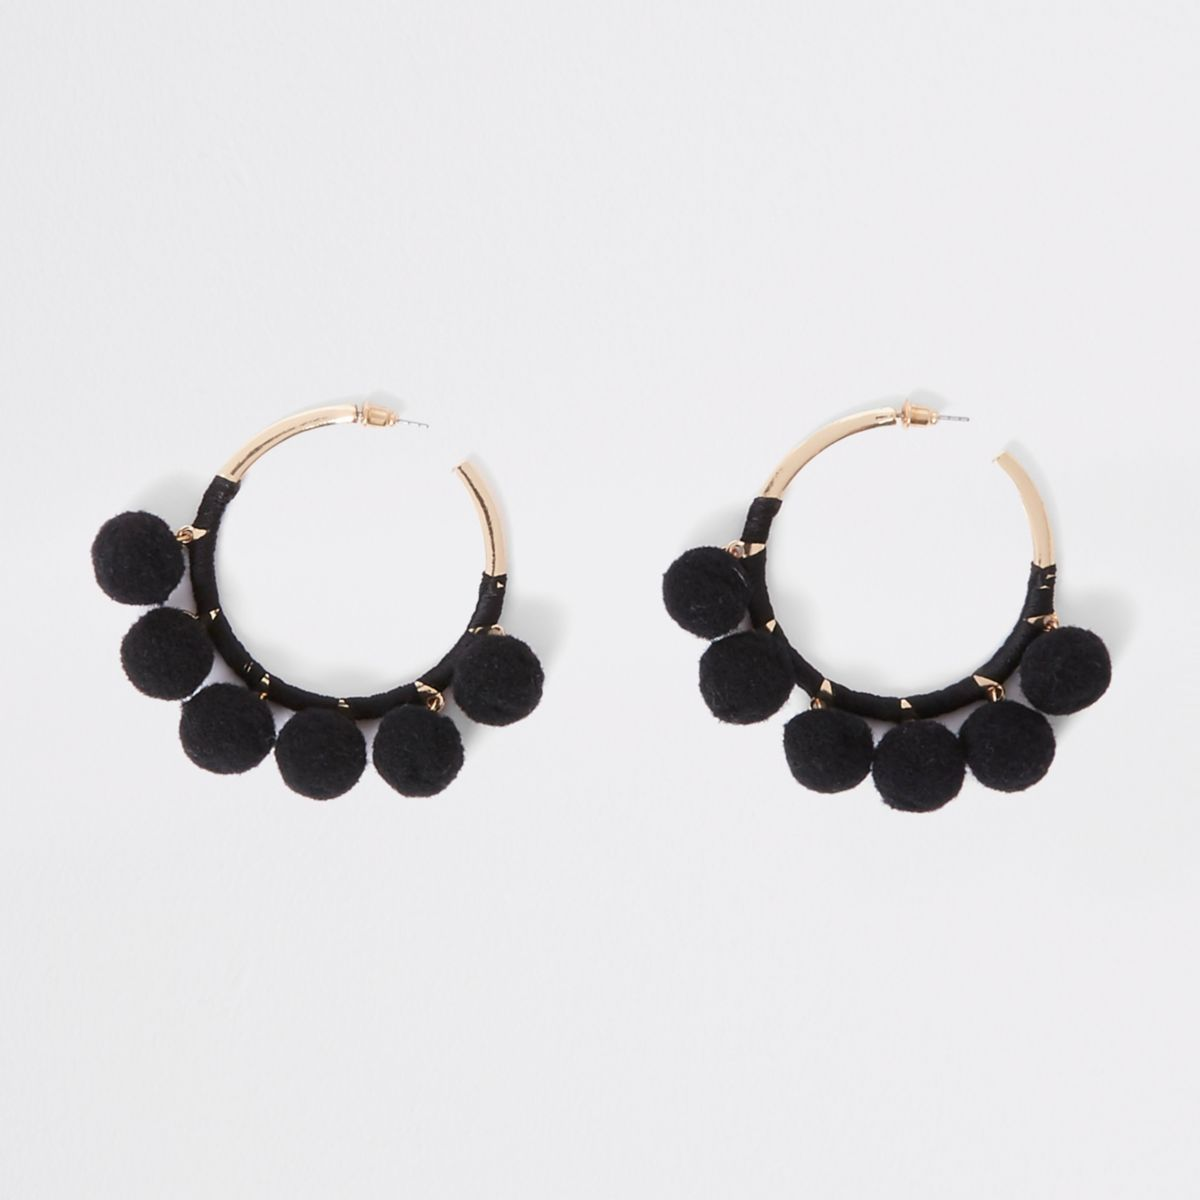 Black pom pom gold tone hoop earrings